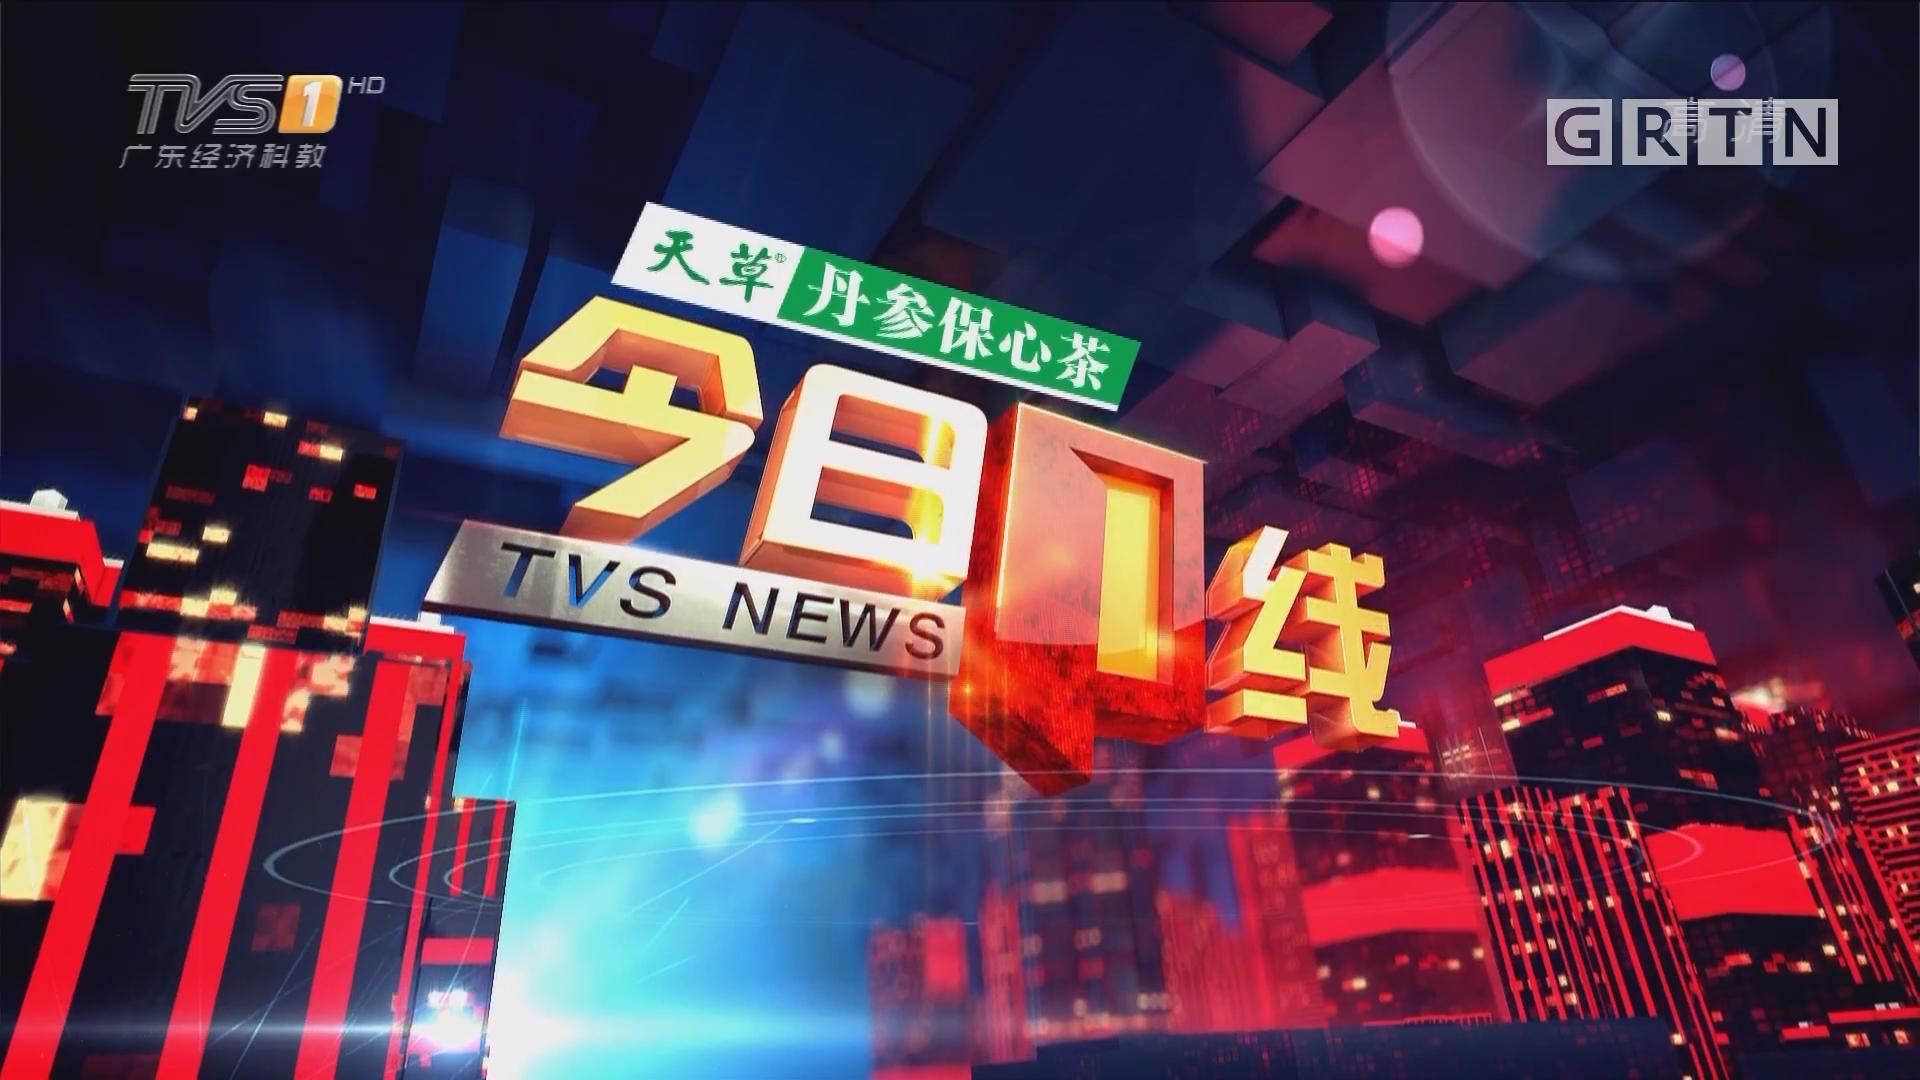 [HD][2018-03-02]今日一线:广东各地闹元宵 茂名:花灯璀璨 过节气氛浓厚